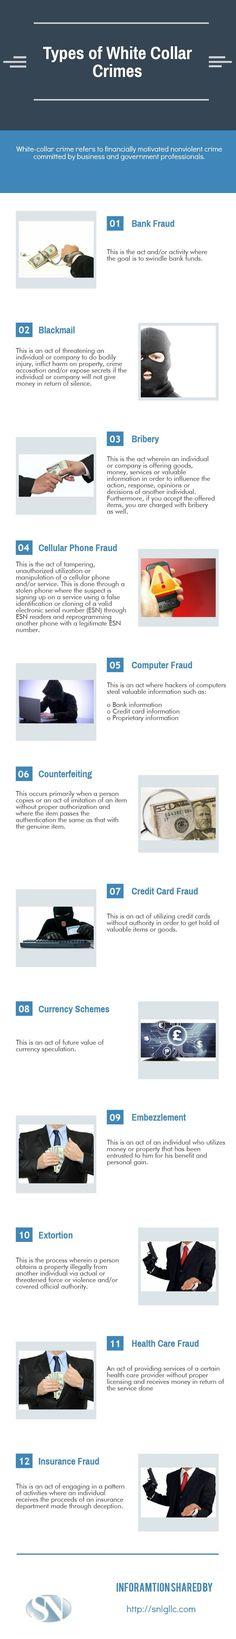 Types of white collar crime